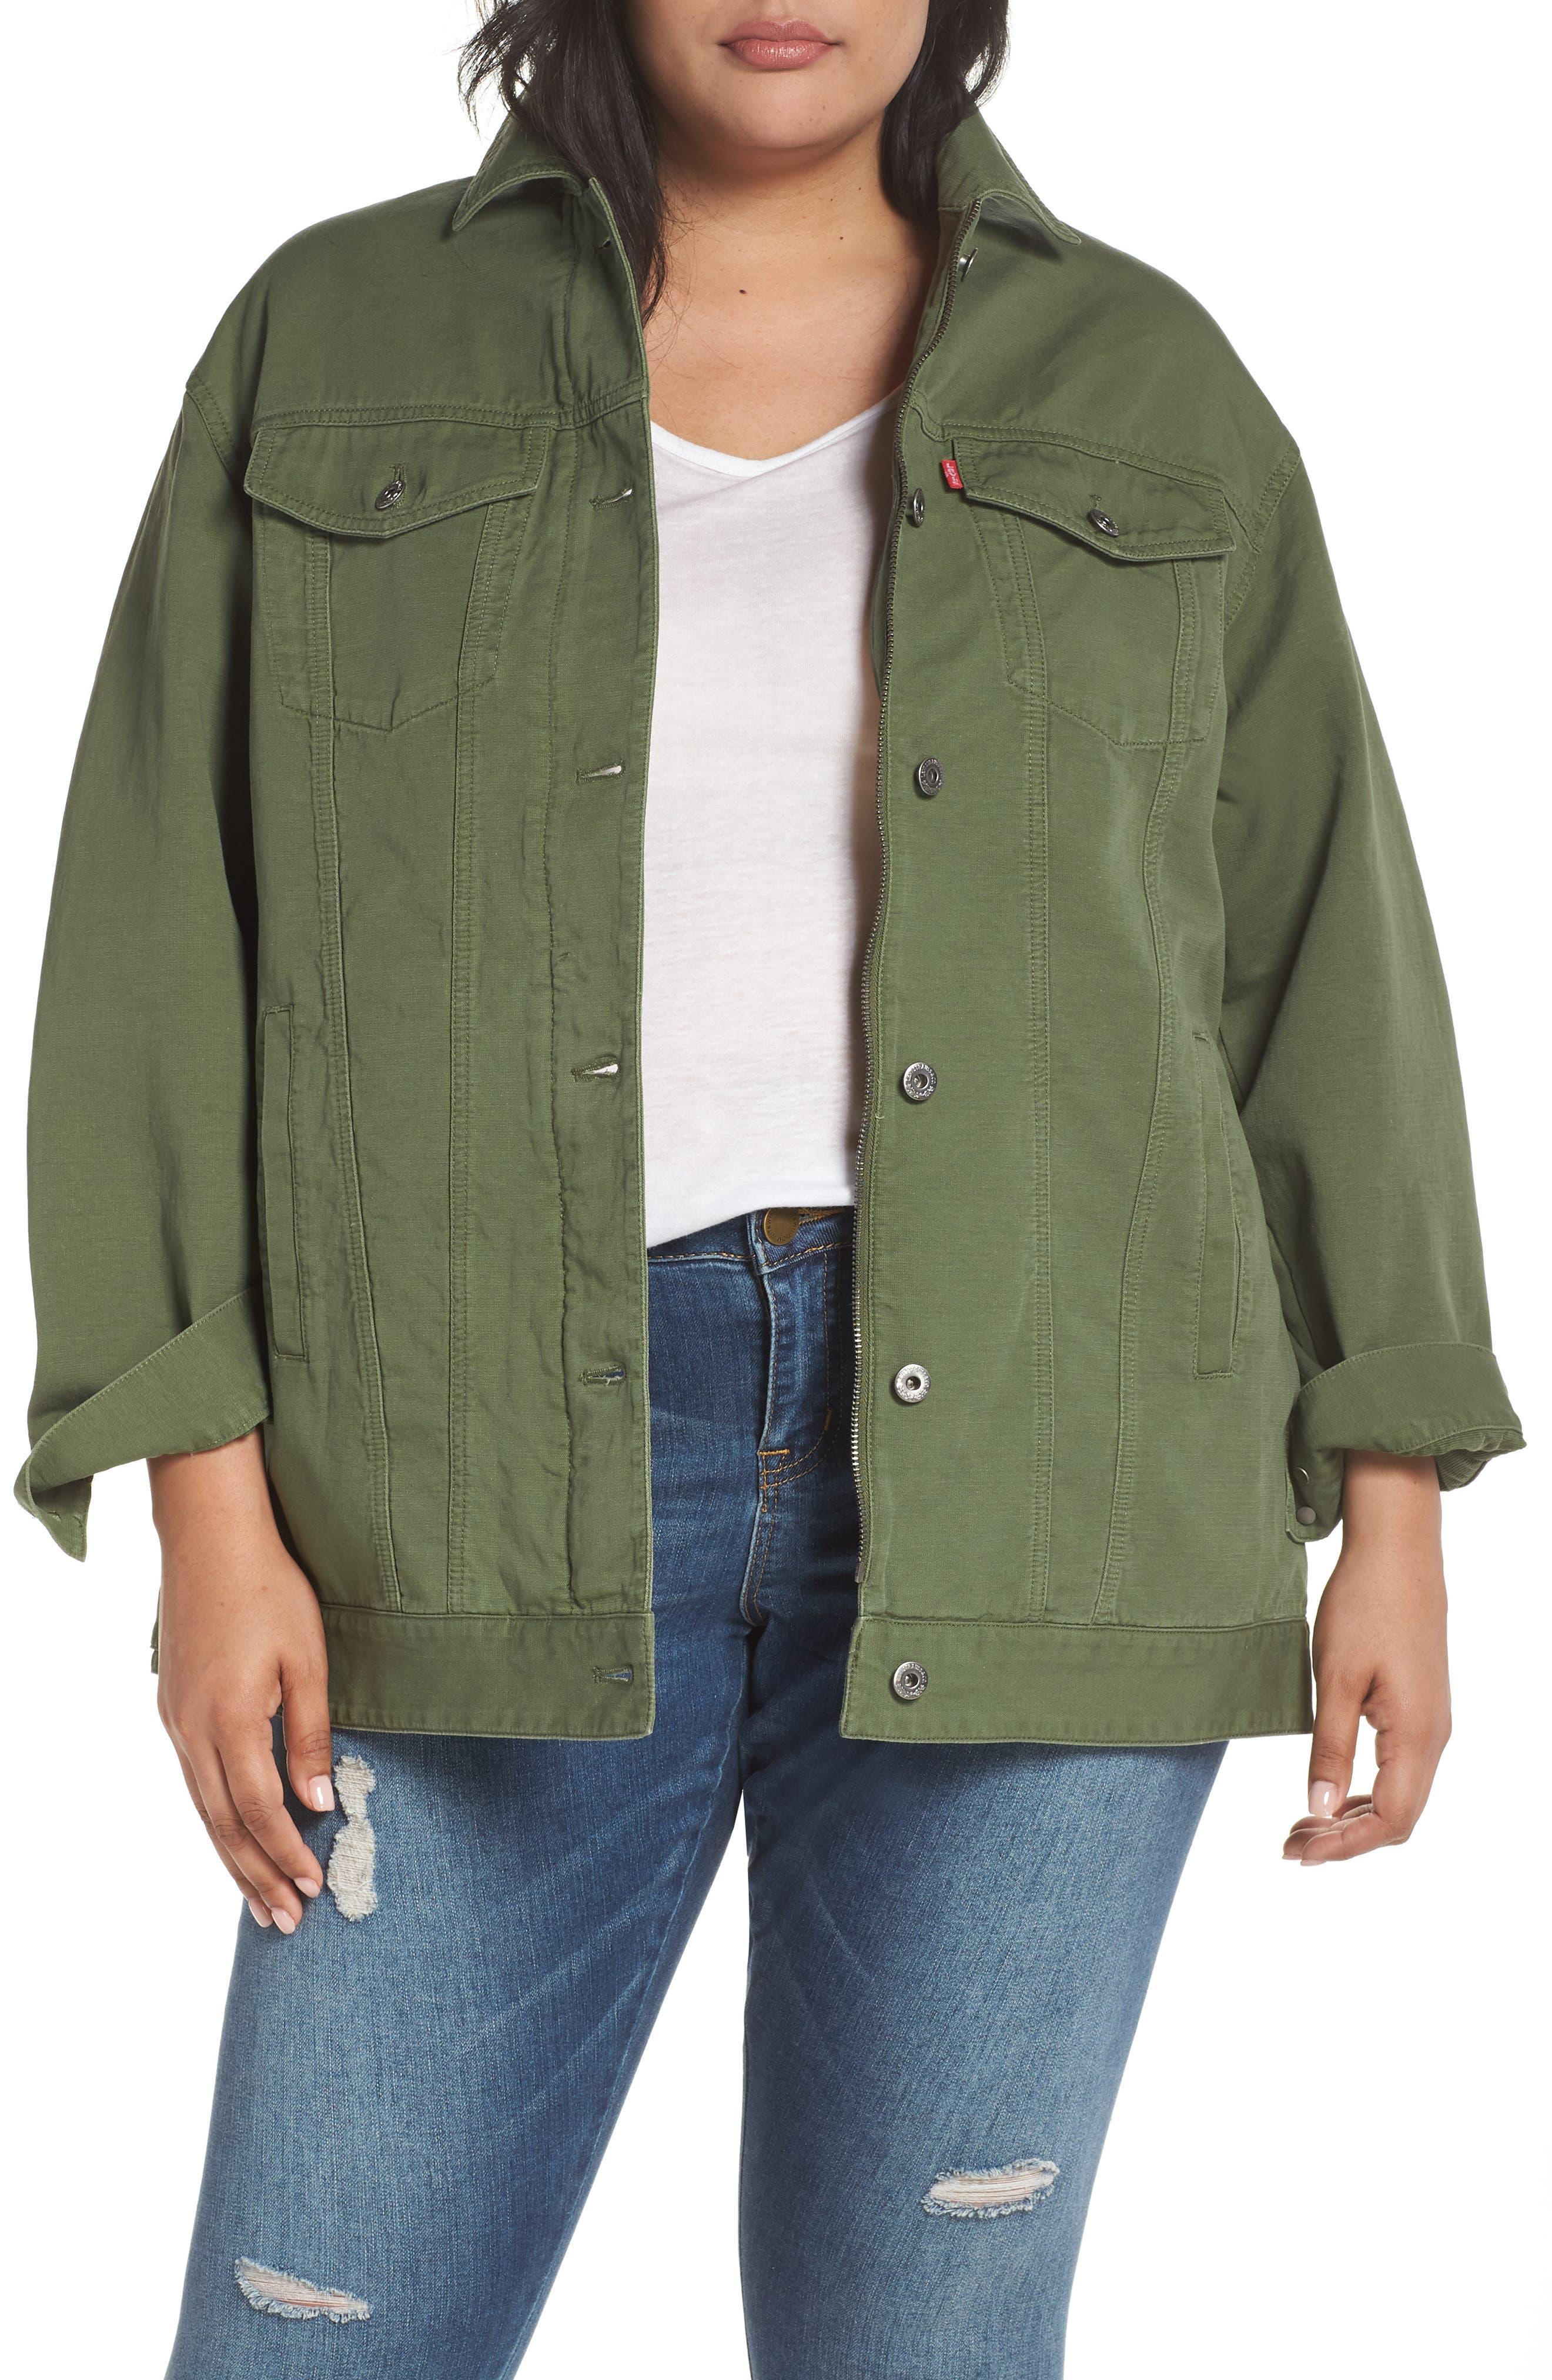 Main Image - Levi's® Oversize Cotton Canvas Trucker Jacket (Plus Size)